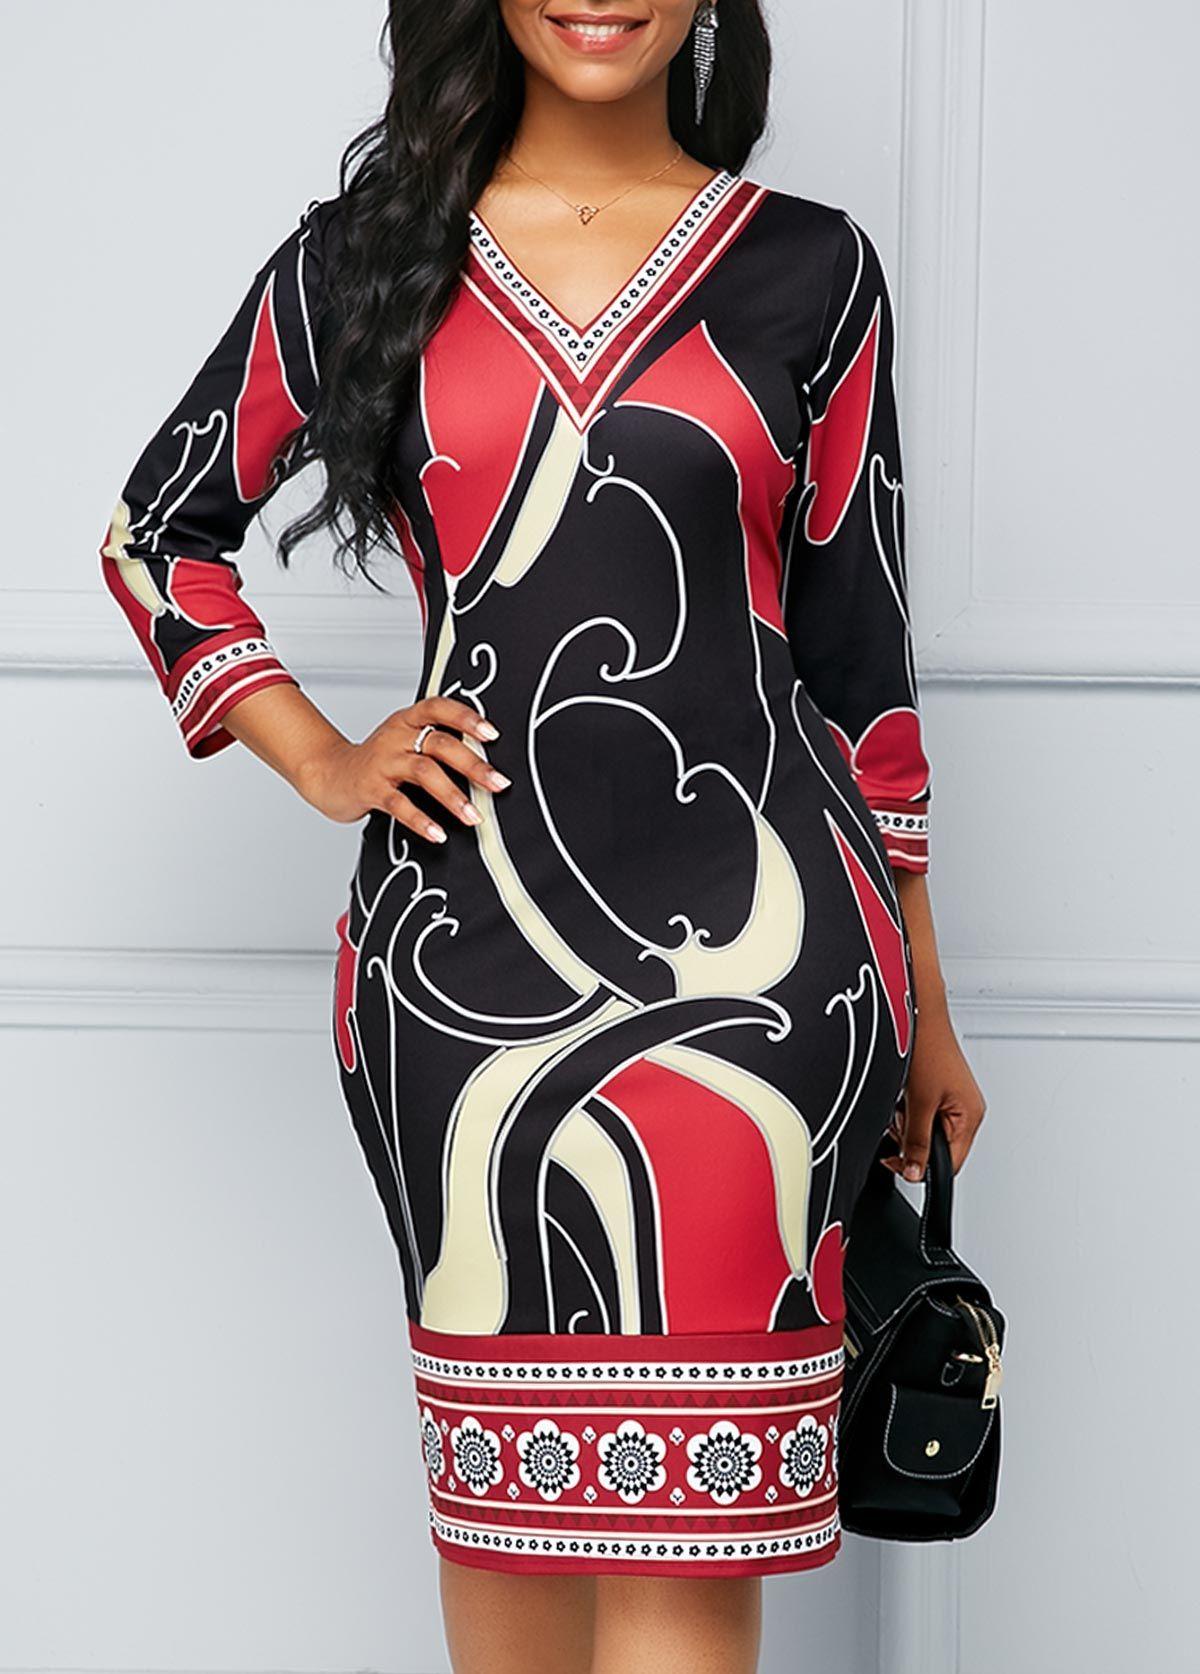 Haul Crew Neck Plain Sleeveless Bodycon Dresses for dubai brand